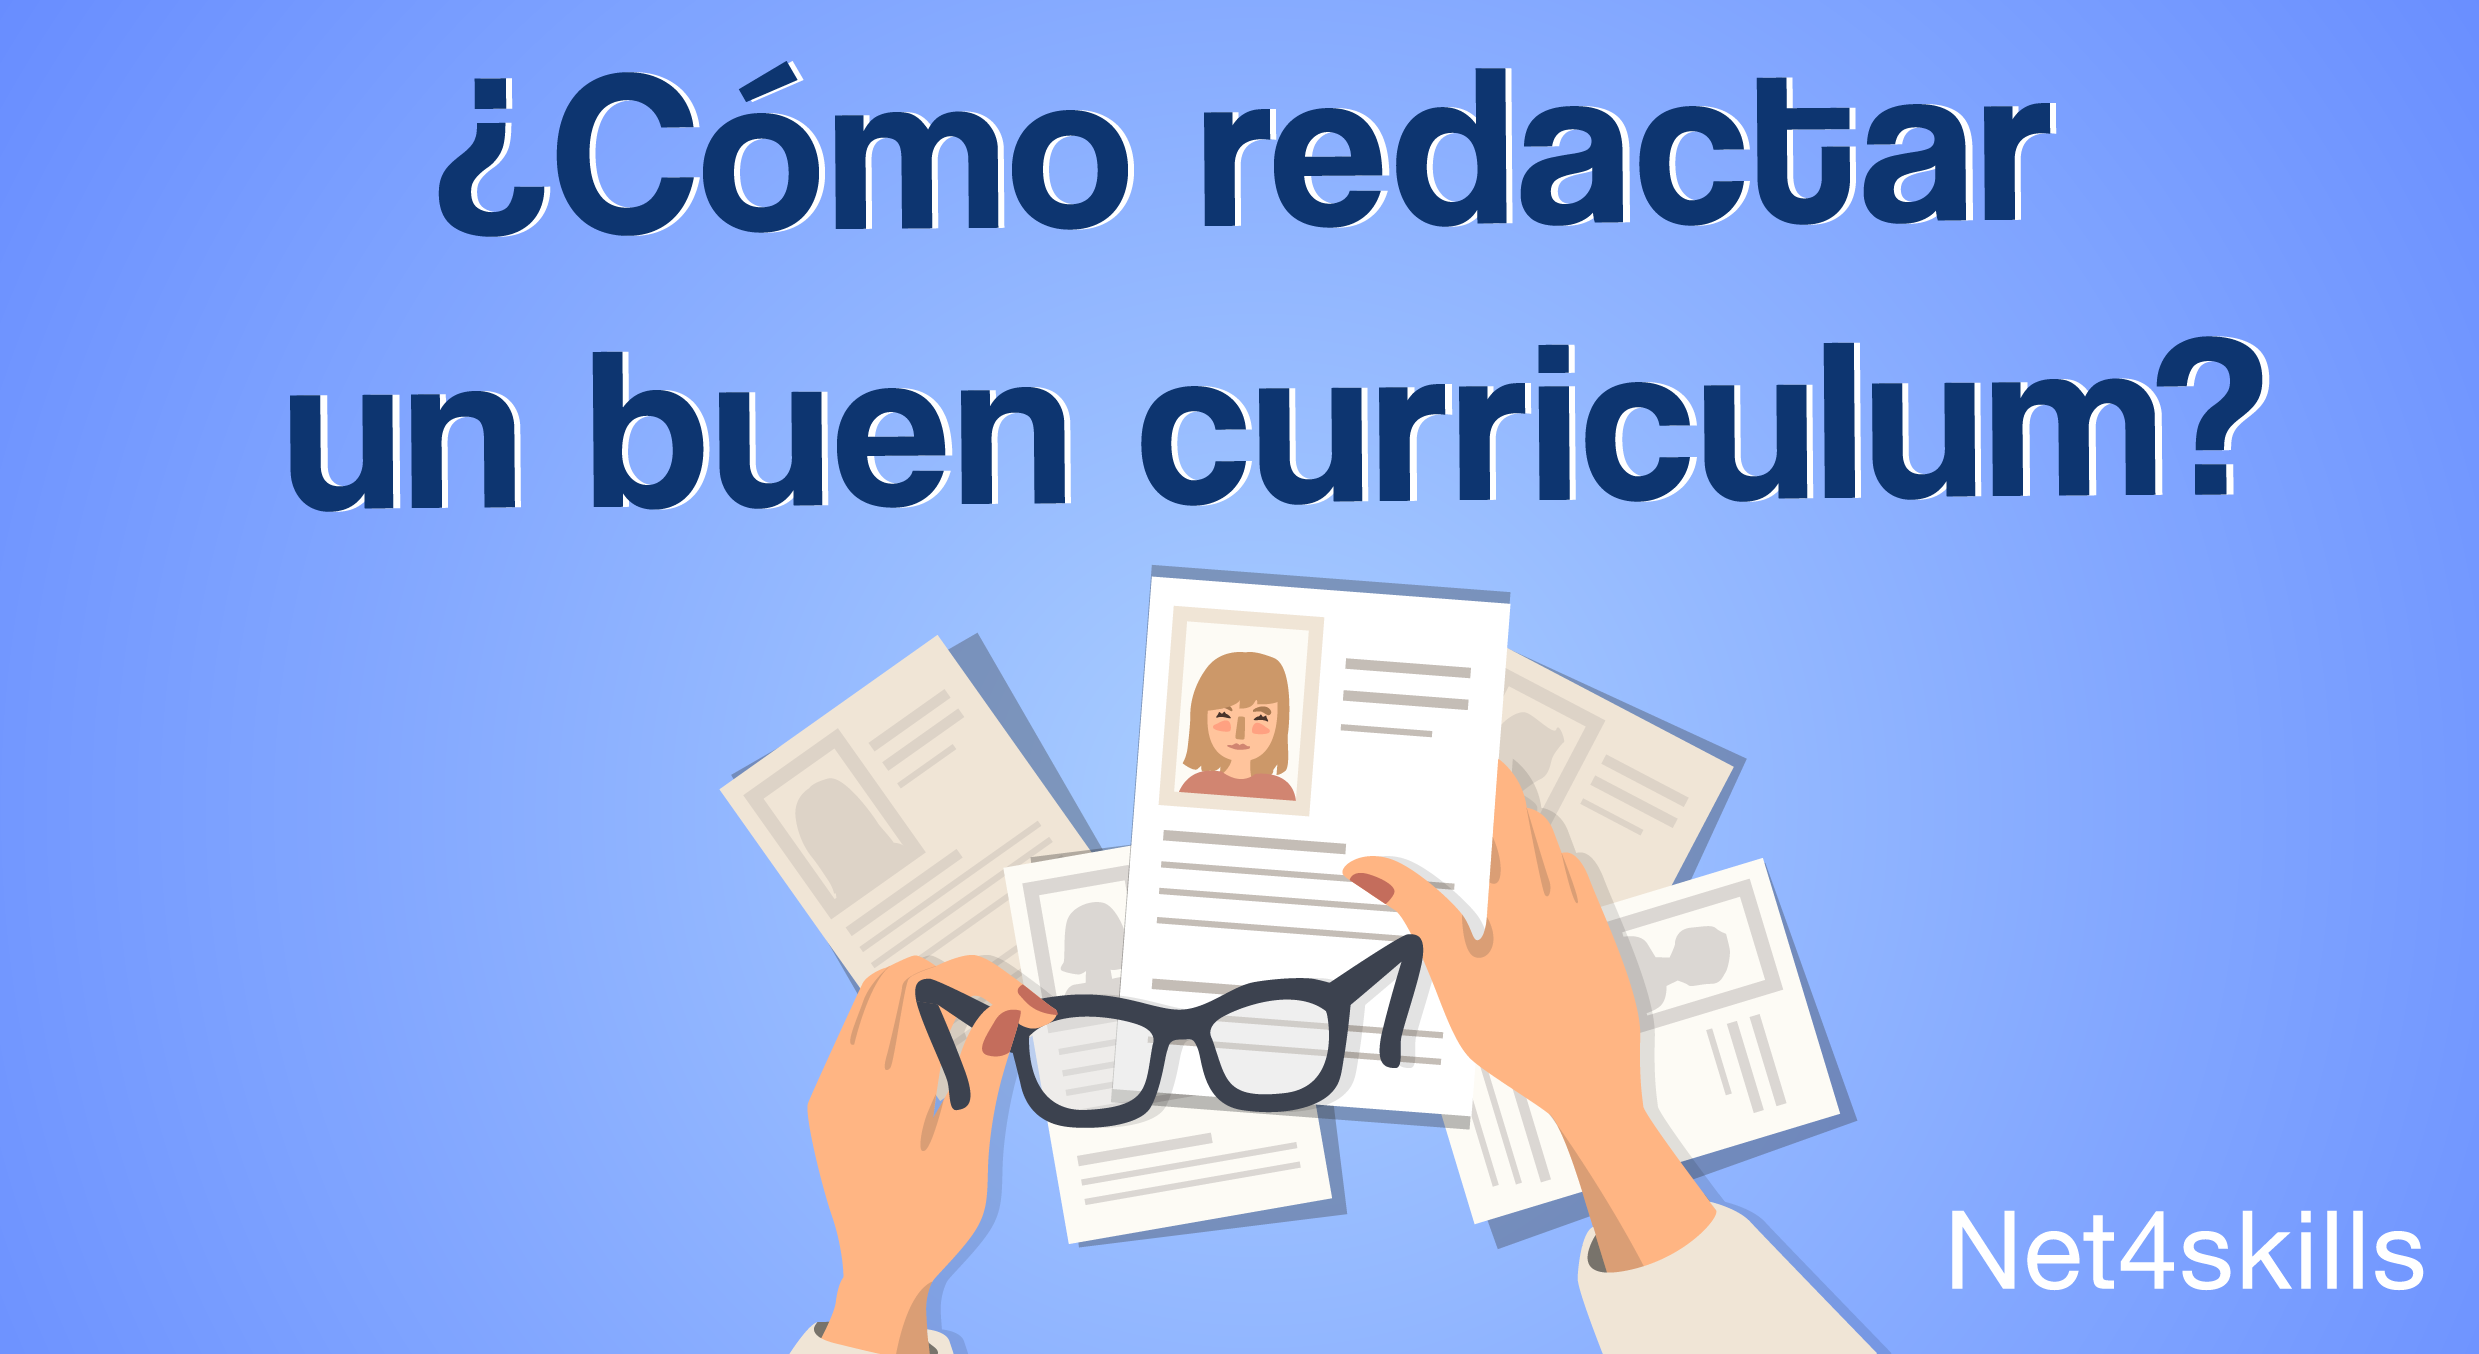 ¿Cómo redactar un buen curriculum?